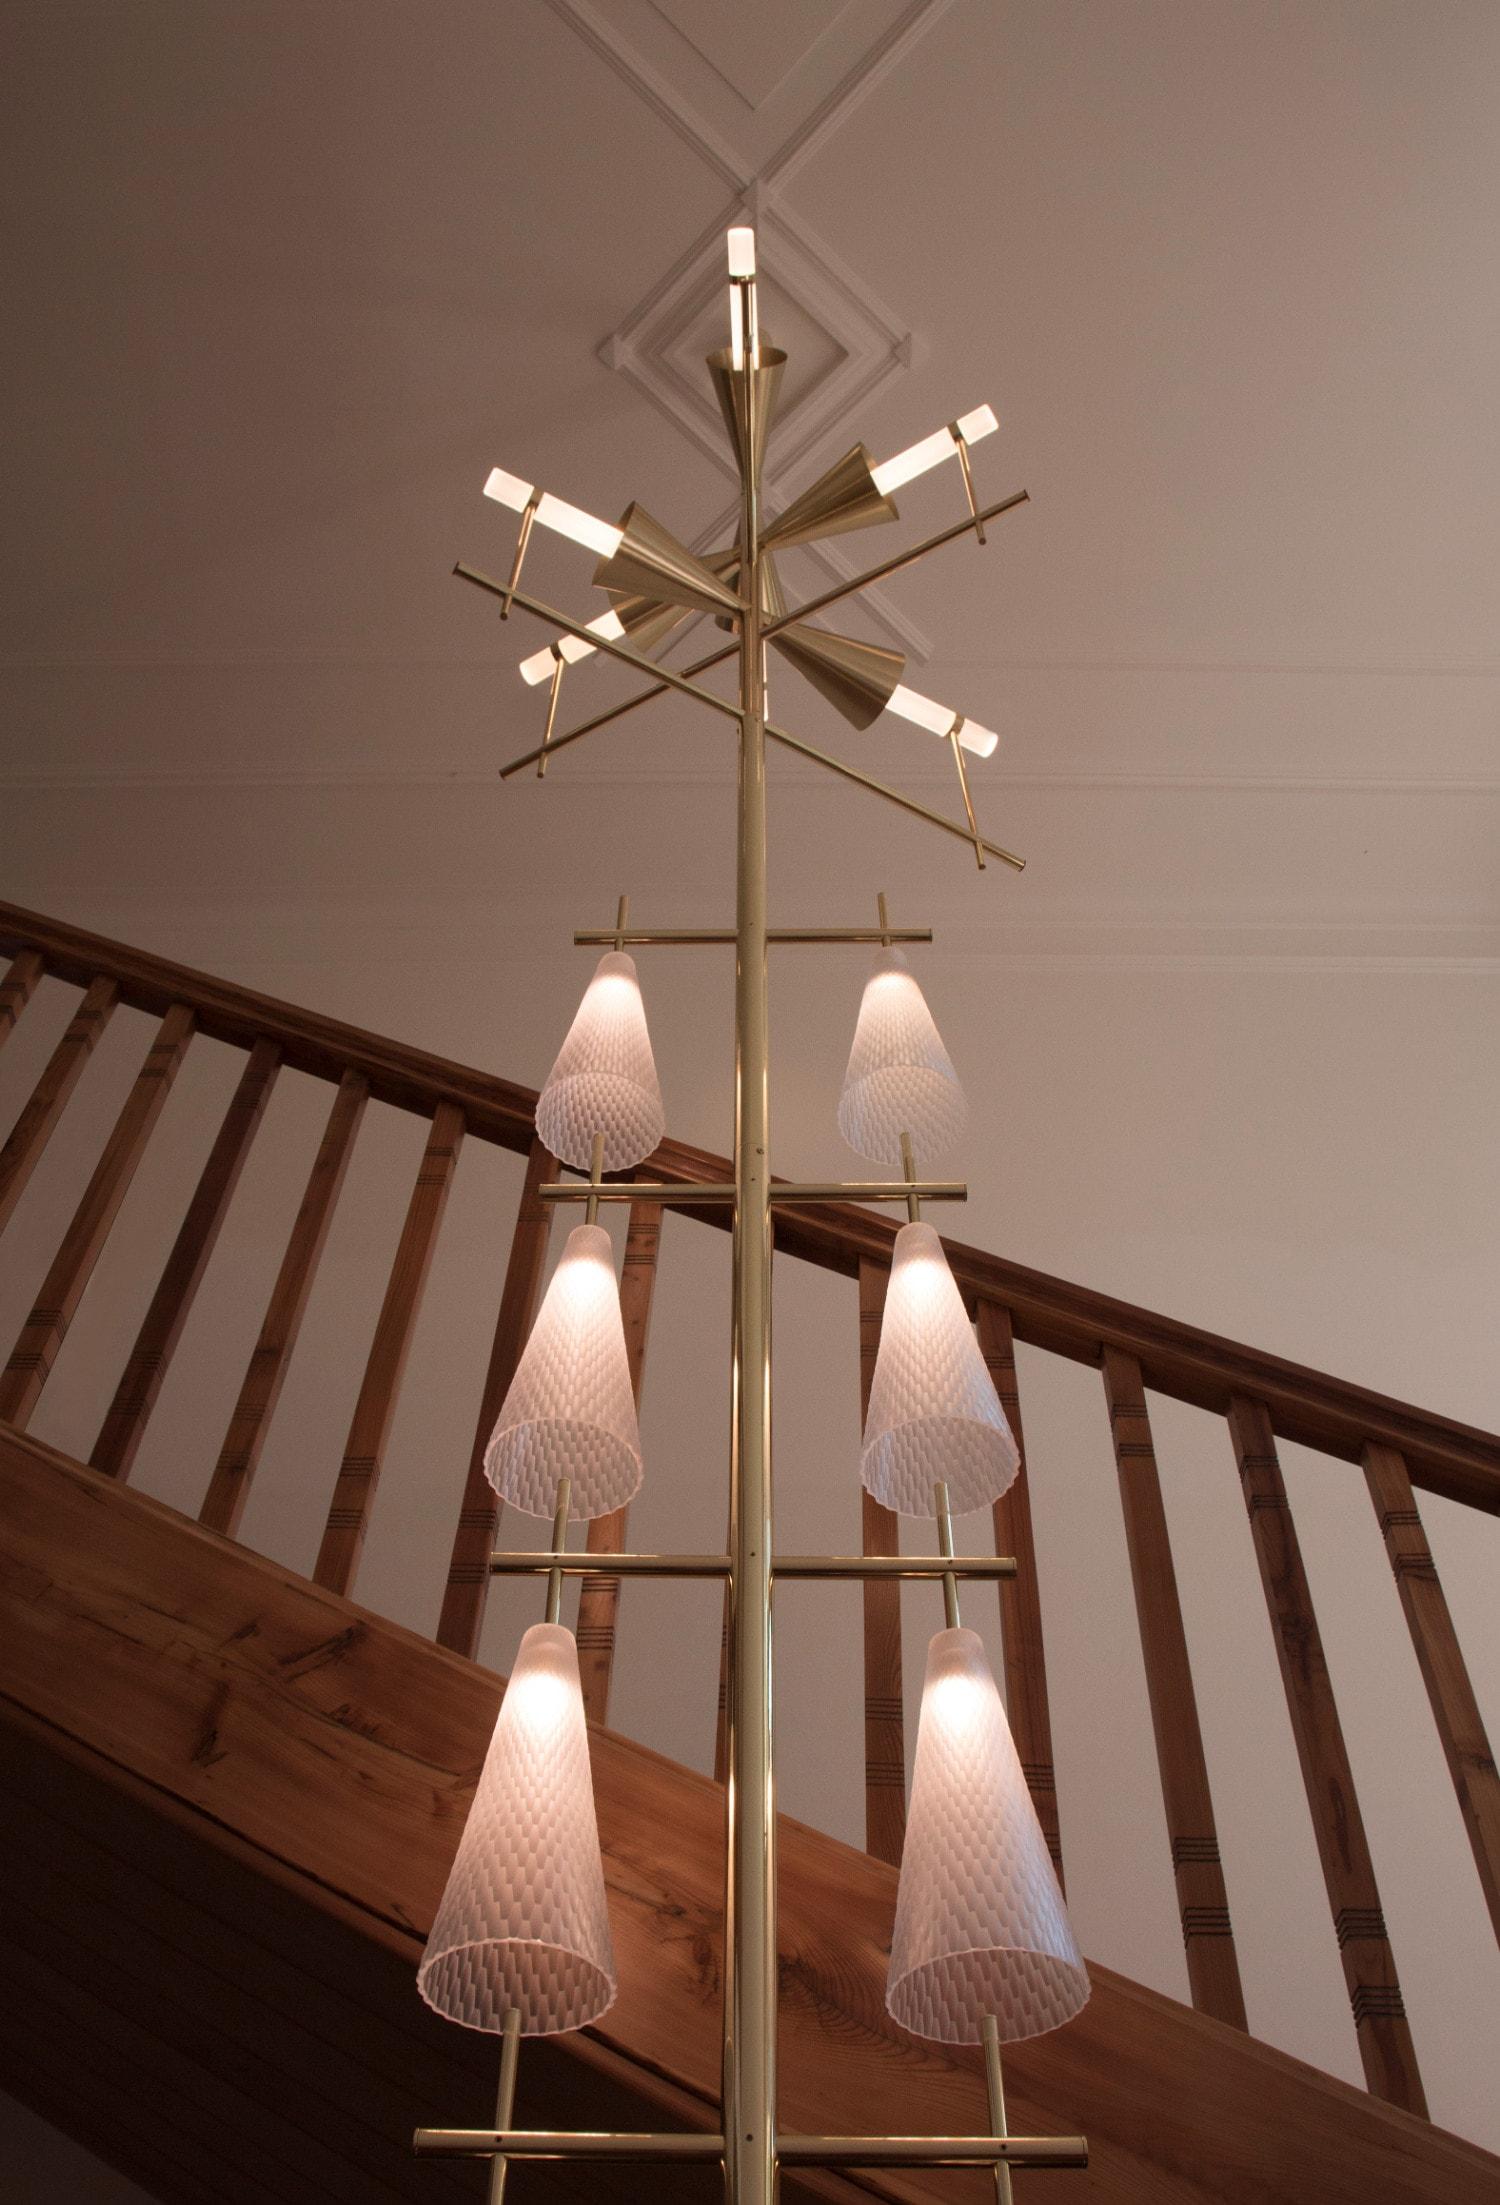 Hydrometridae-site-specific-lighting-object-chandelier-svítidlo-lustr-design-rony-plesl-and-jiri-krejcirik